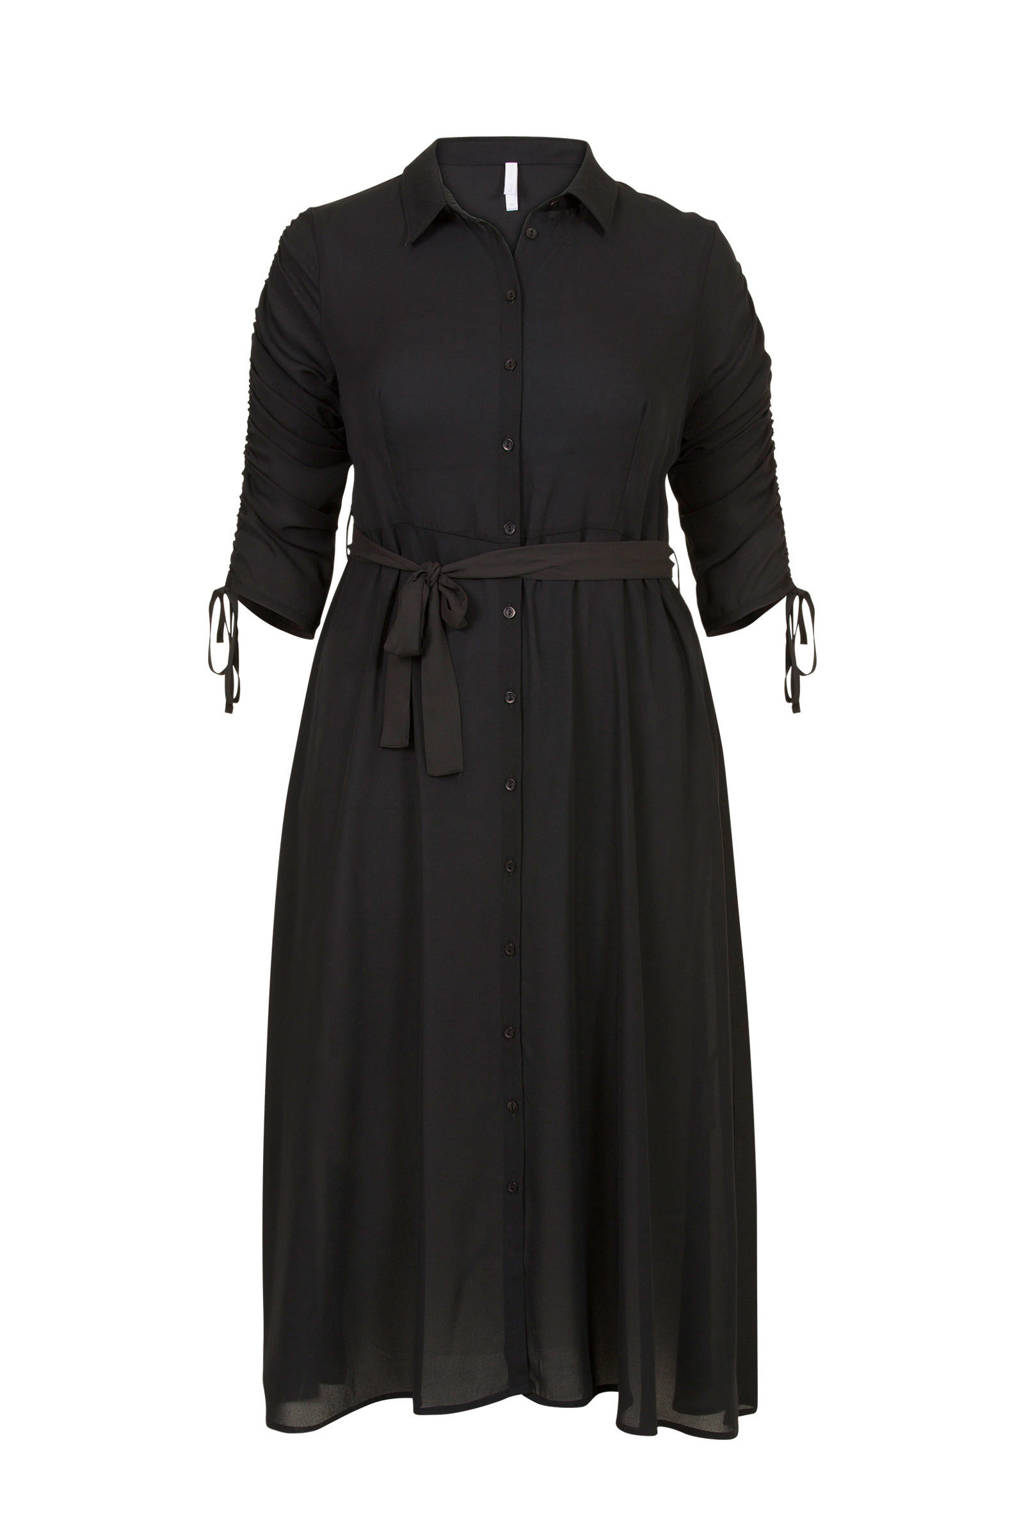 Miss Etam Plus blousejurk met taillestrik, Zwart